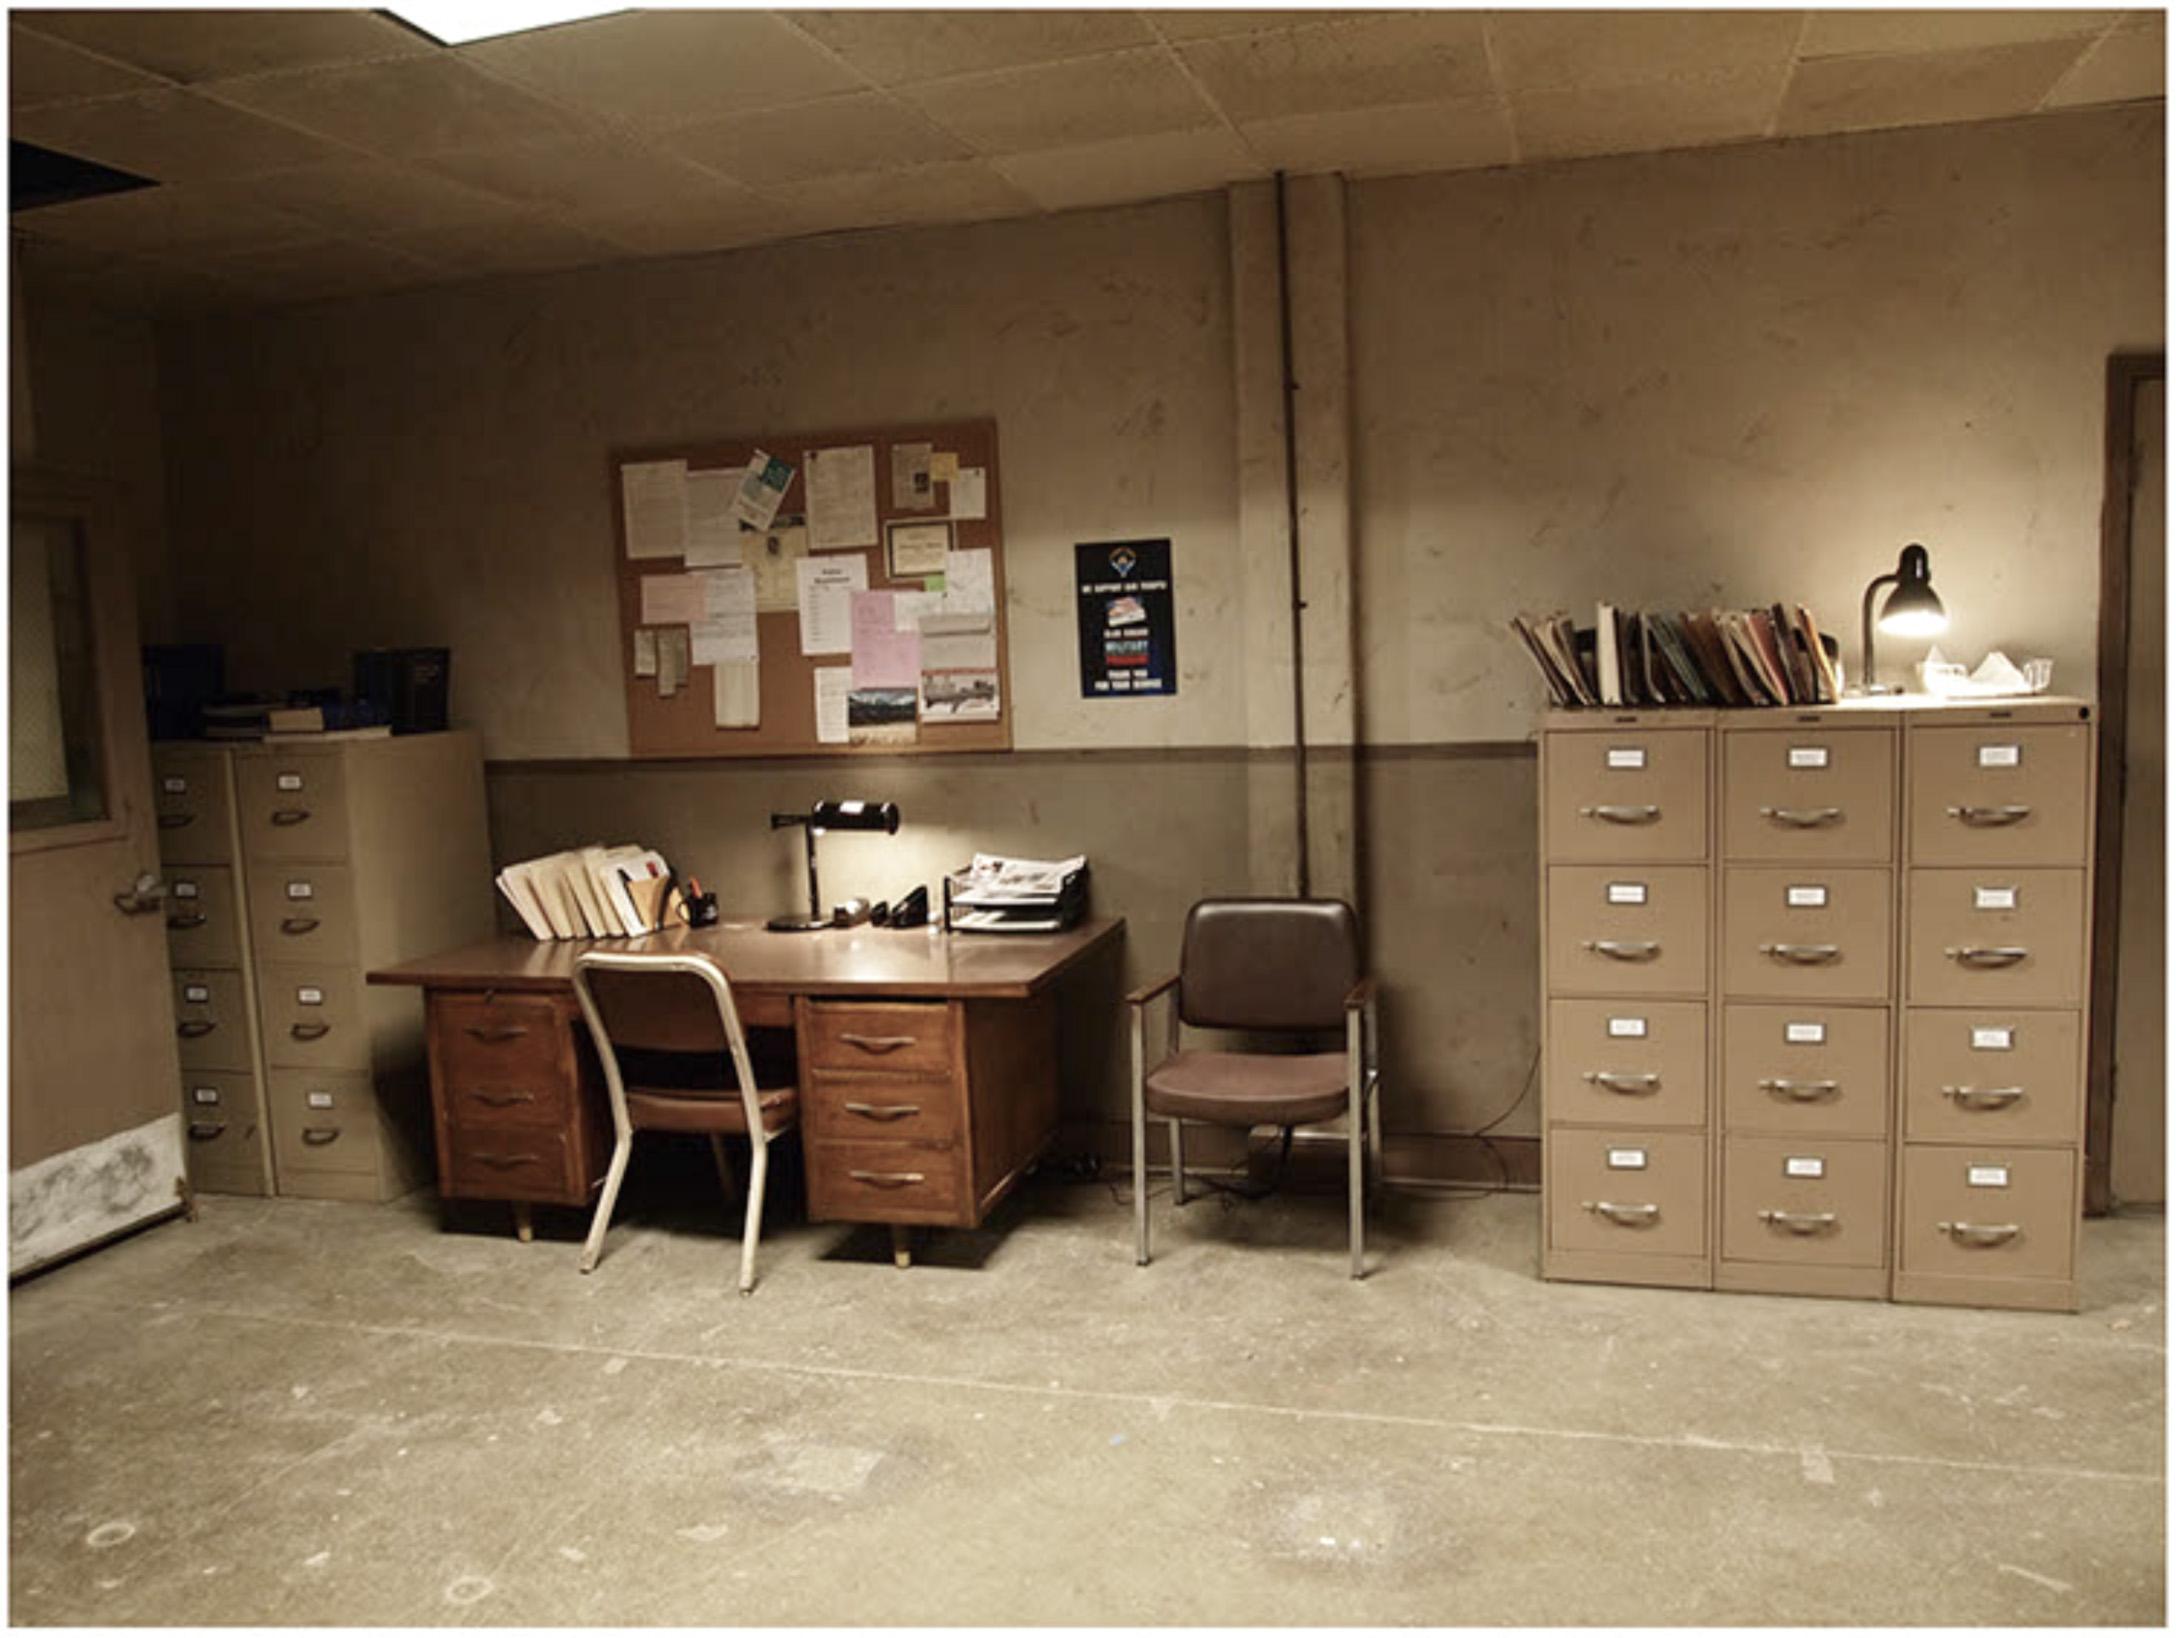 'CADI' OFFICES - SET PHOTO